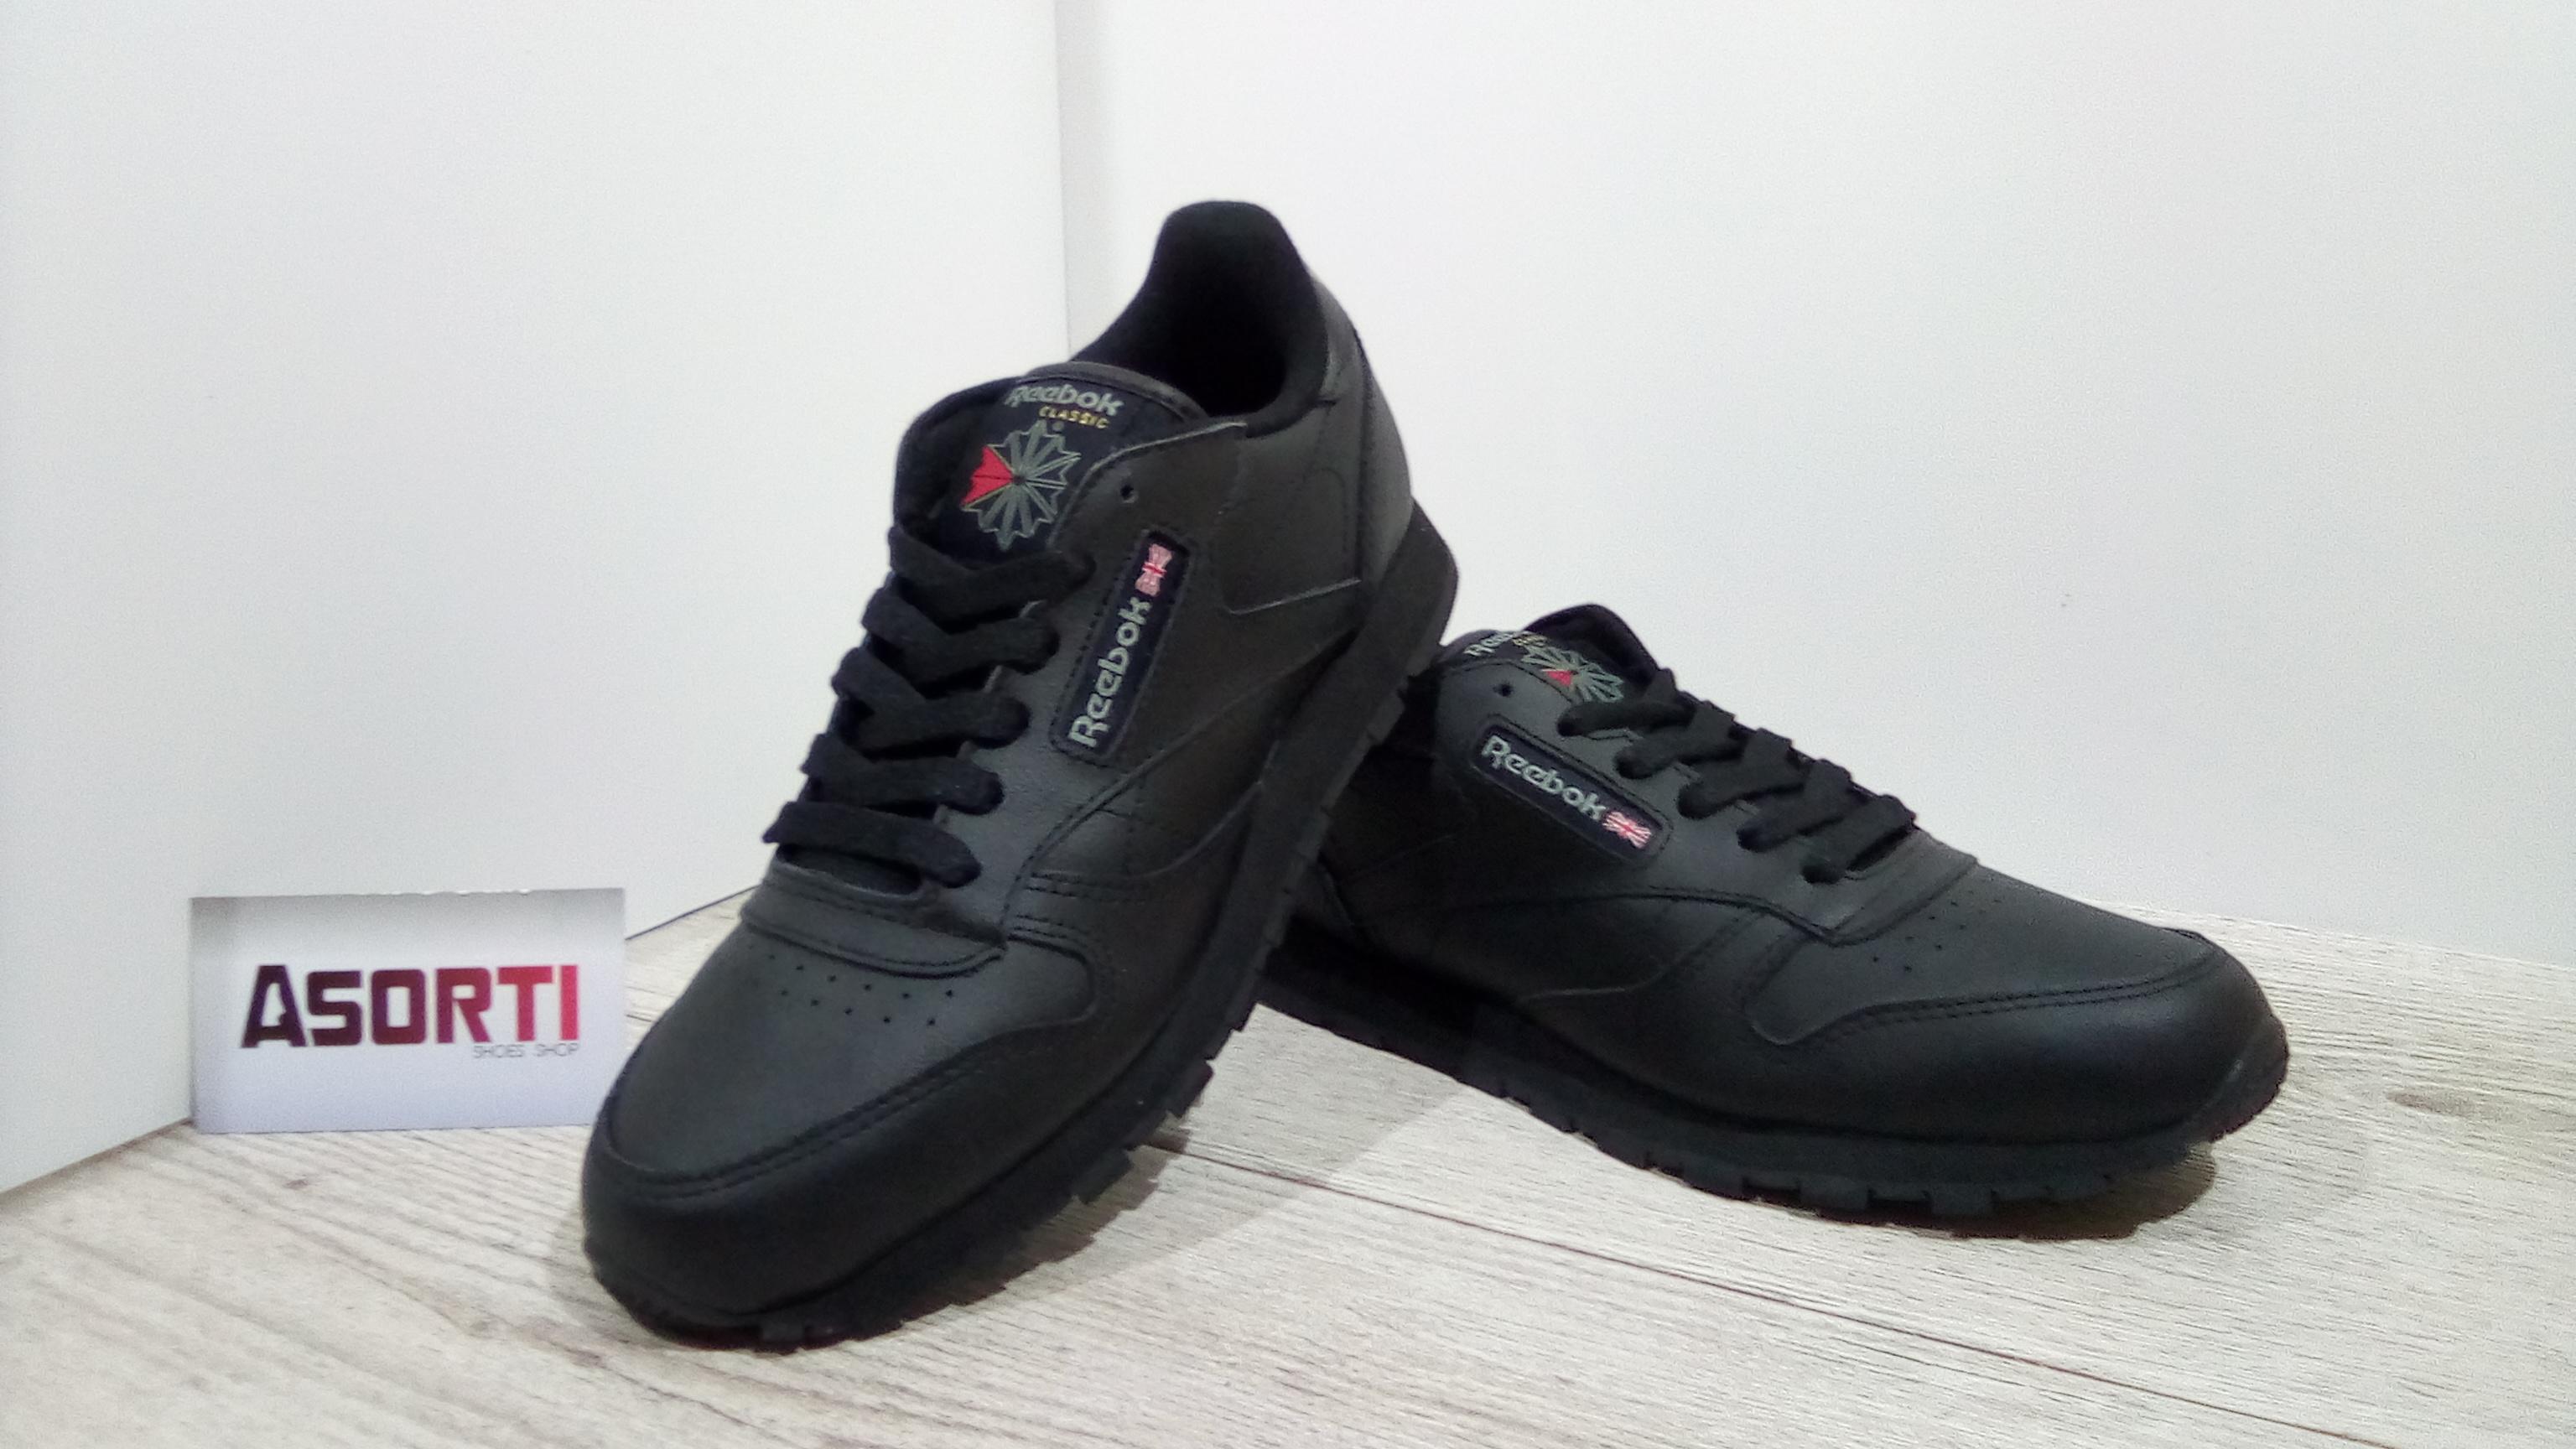 hot sale online multiple colors wholesale outlet Жіночі кросівки Reebok Classic Leather чорні (50149)